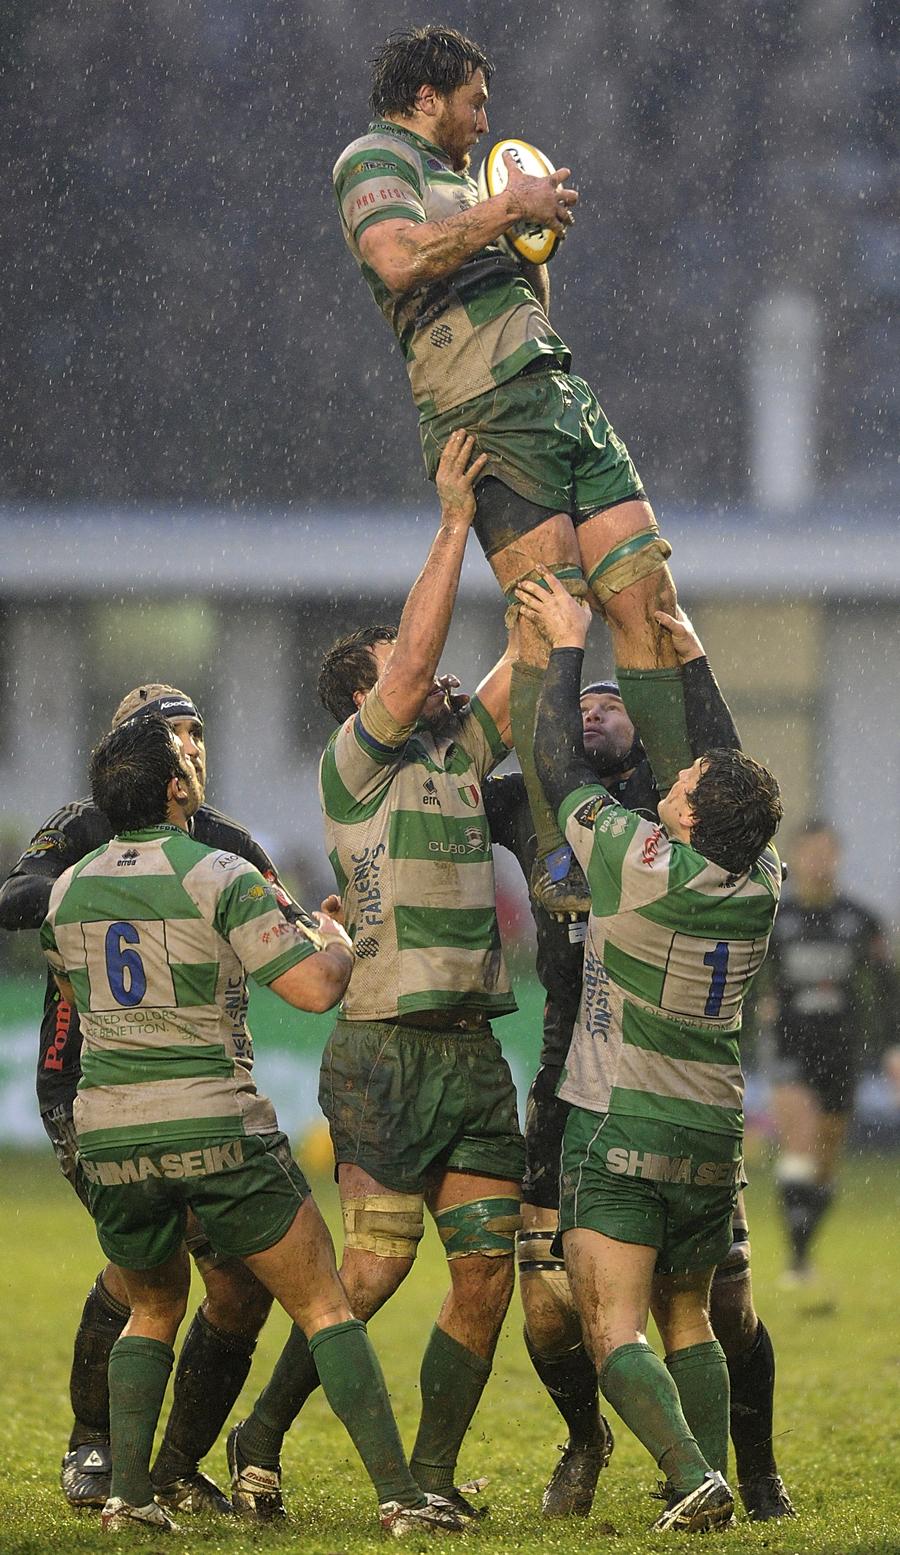 Treviso's Antonio Pavanello claims a lineout